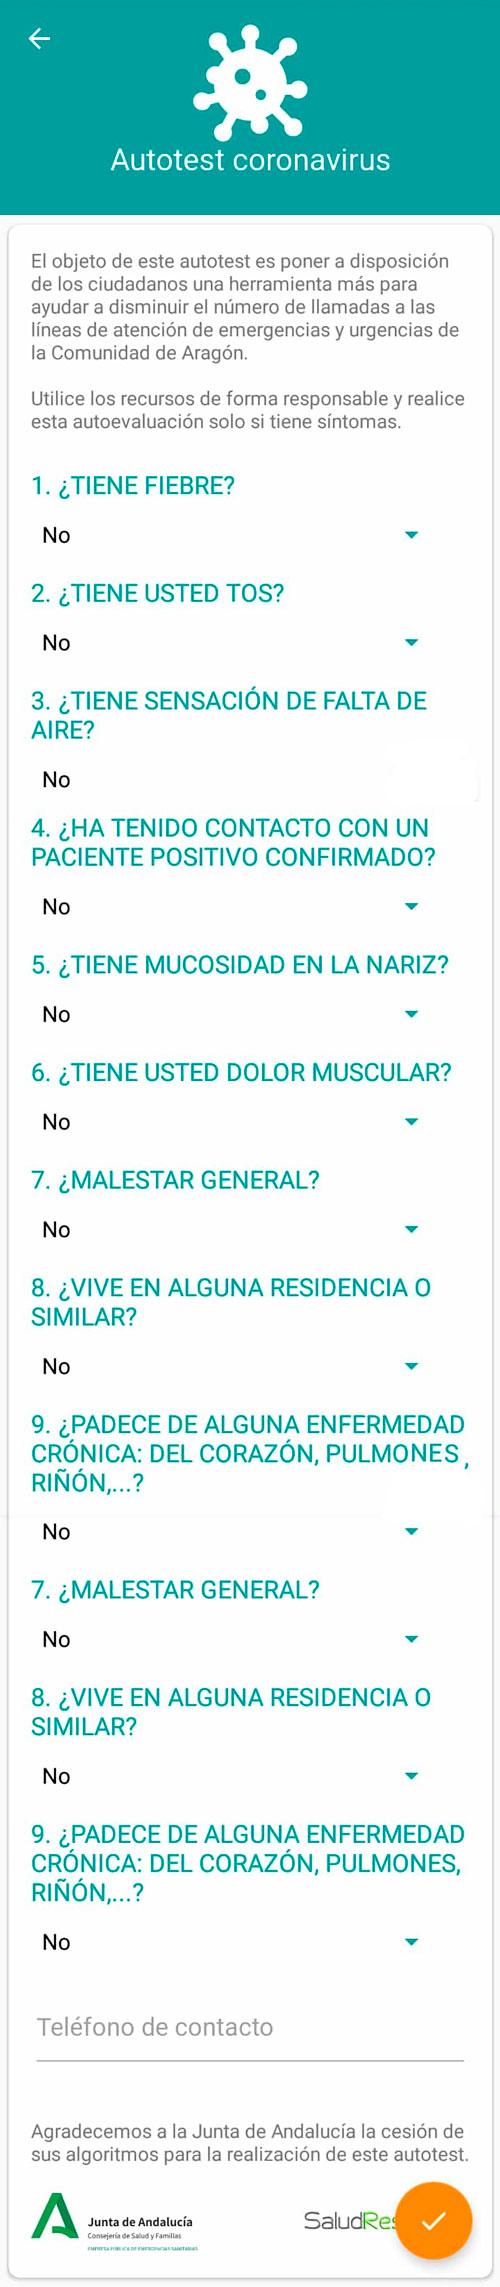 APP Salud Informa - Coronavirus